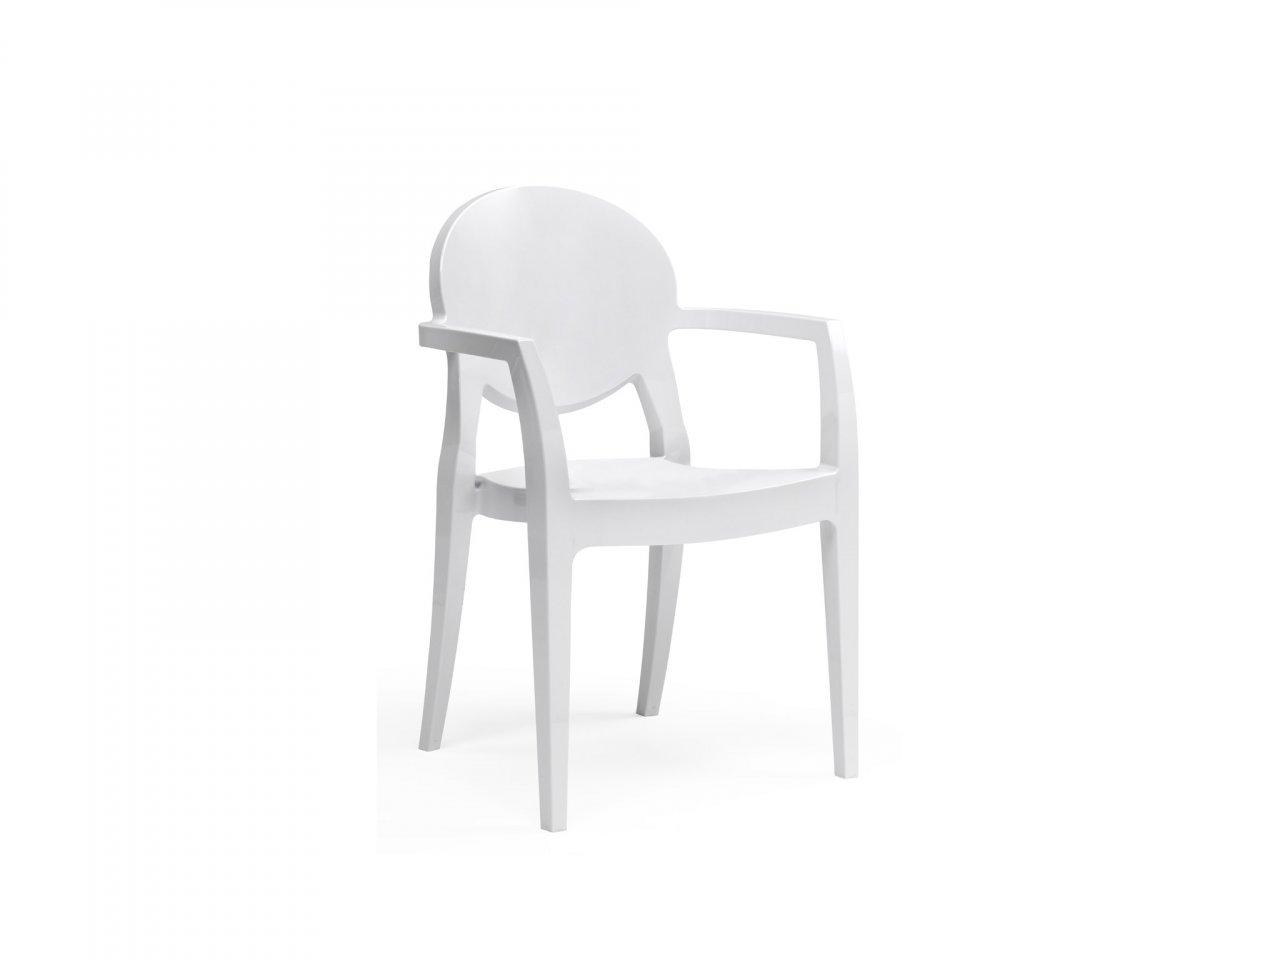 Sedia Con Braccioli Igloo Tecnopolimero - v6